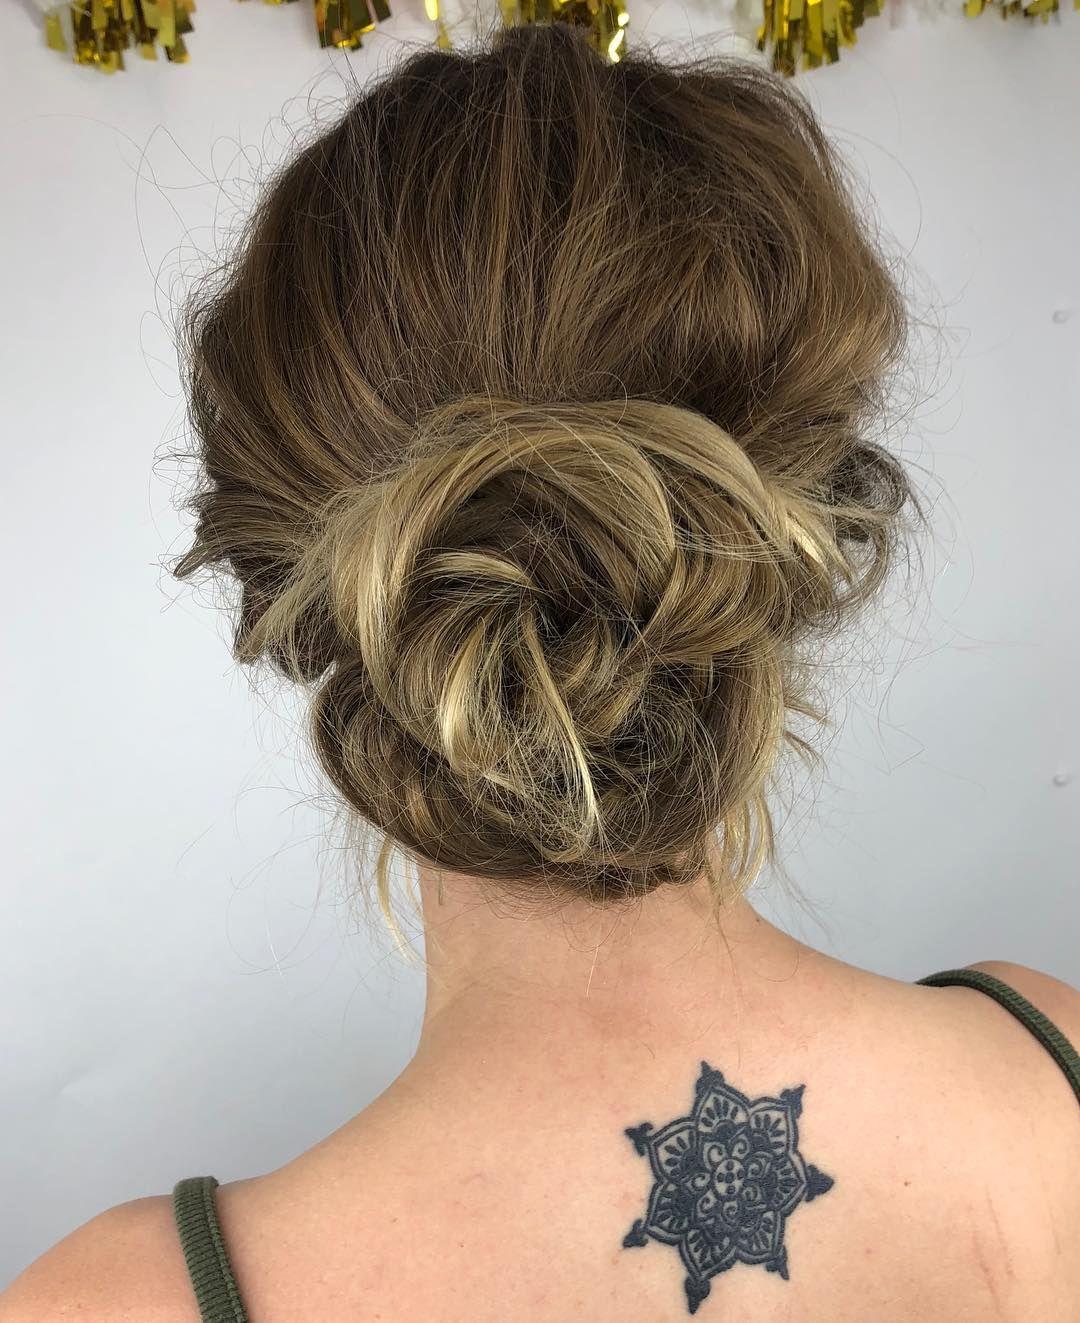 Hairstyle inspiration : Glendora Balayage Specialist